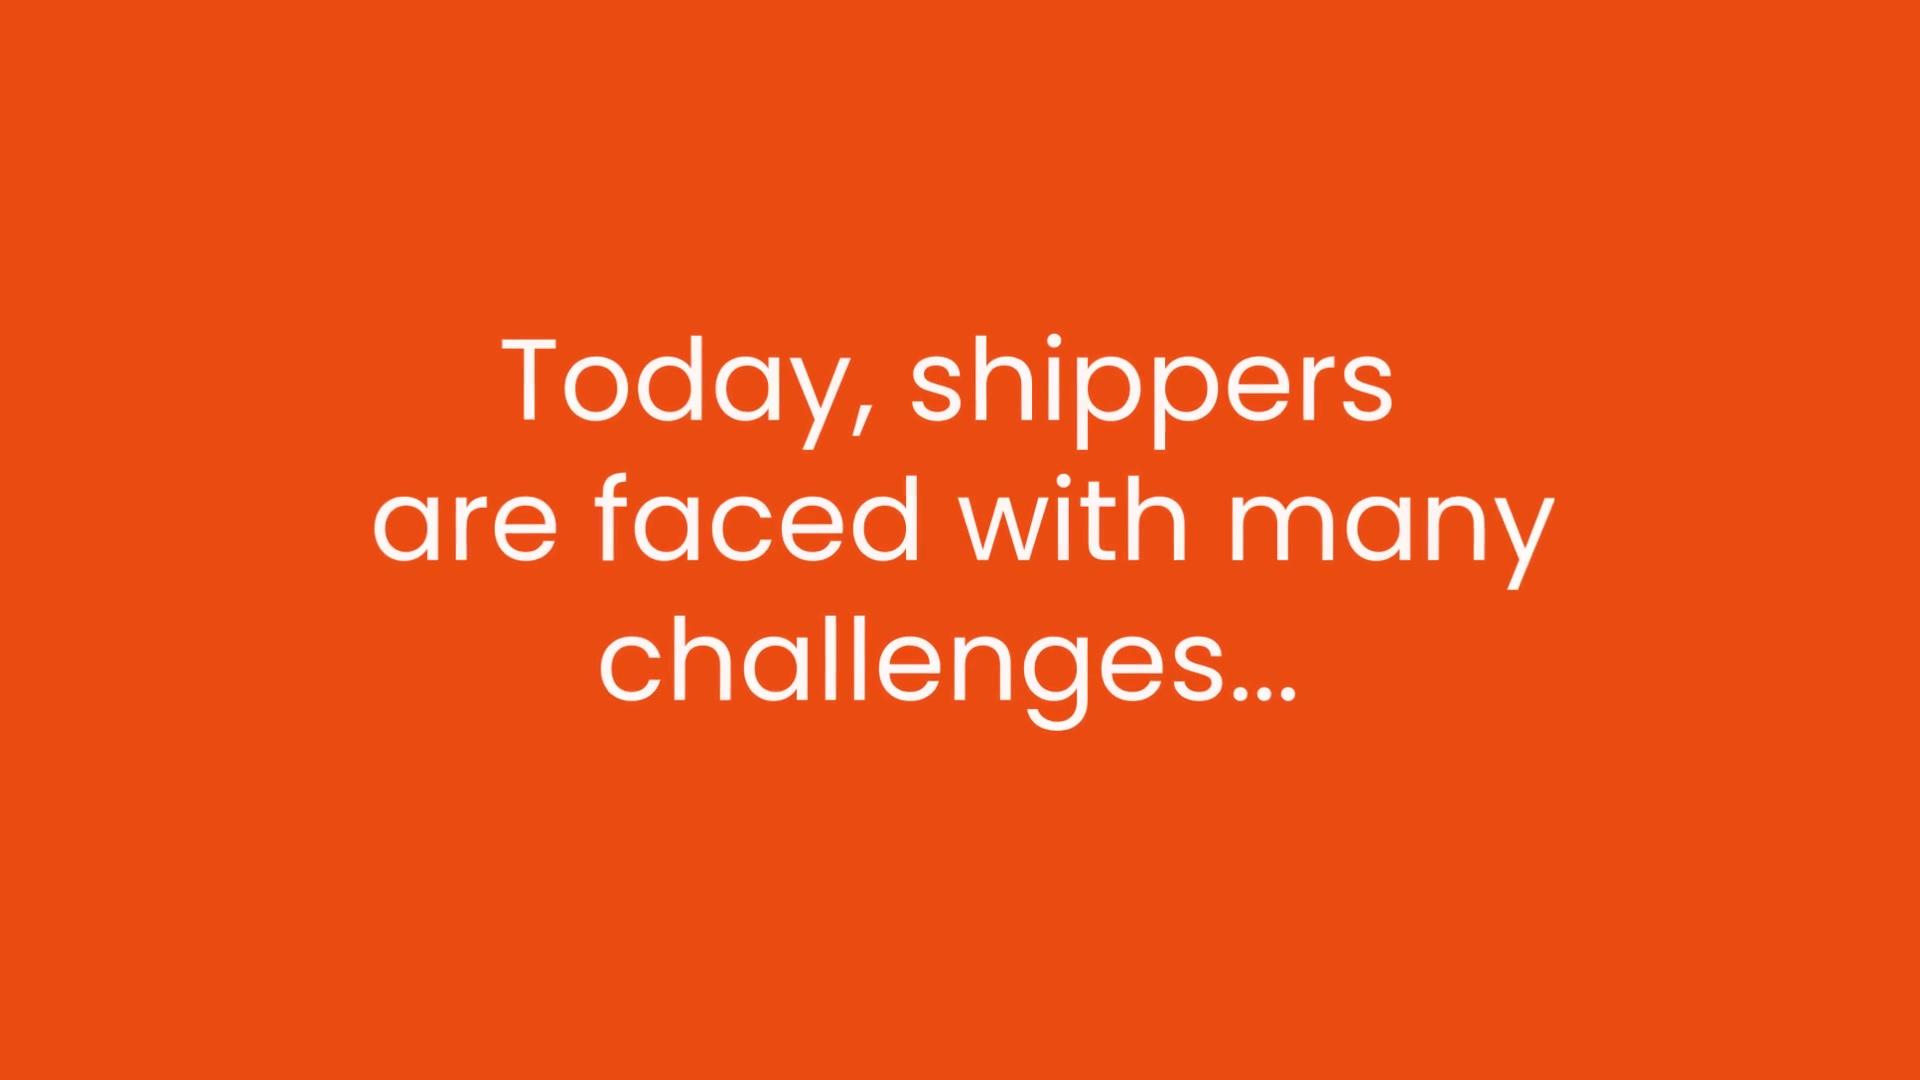 Shipper #2